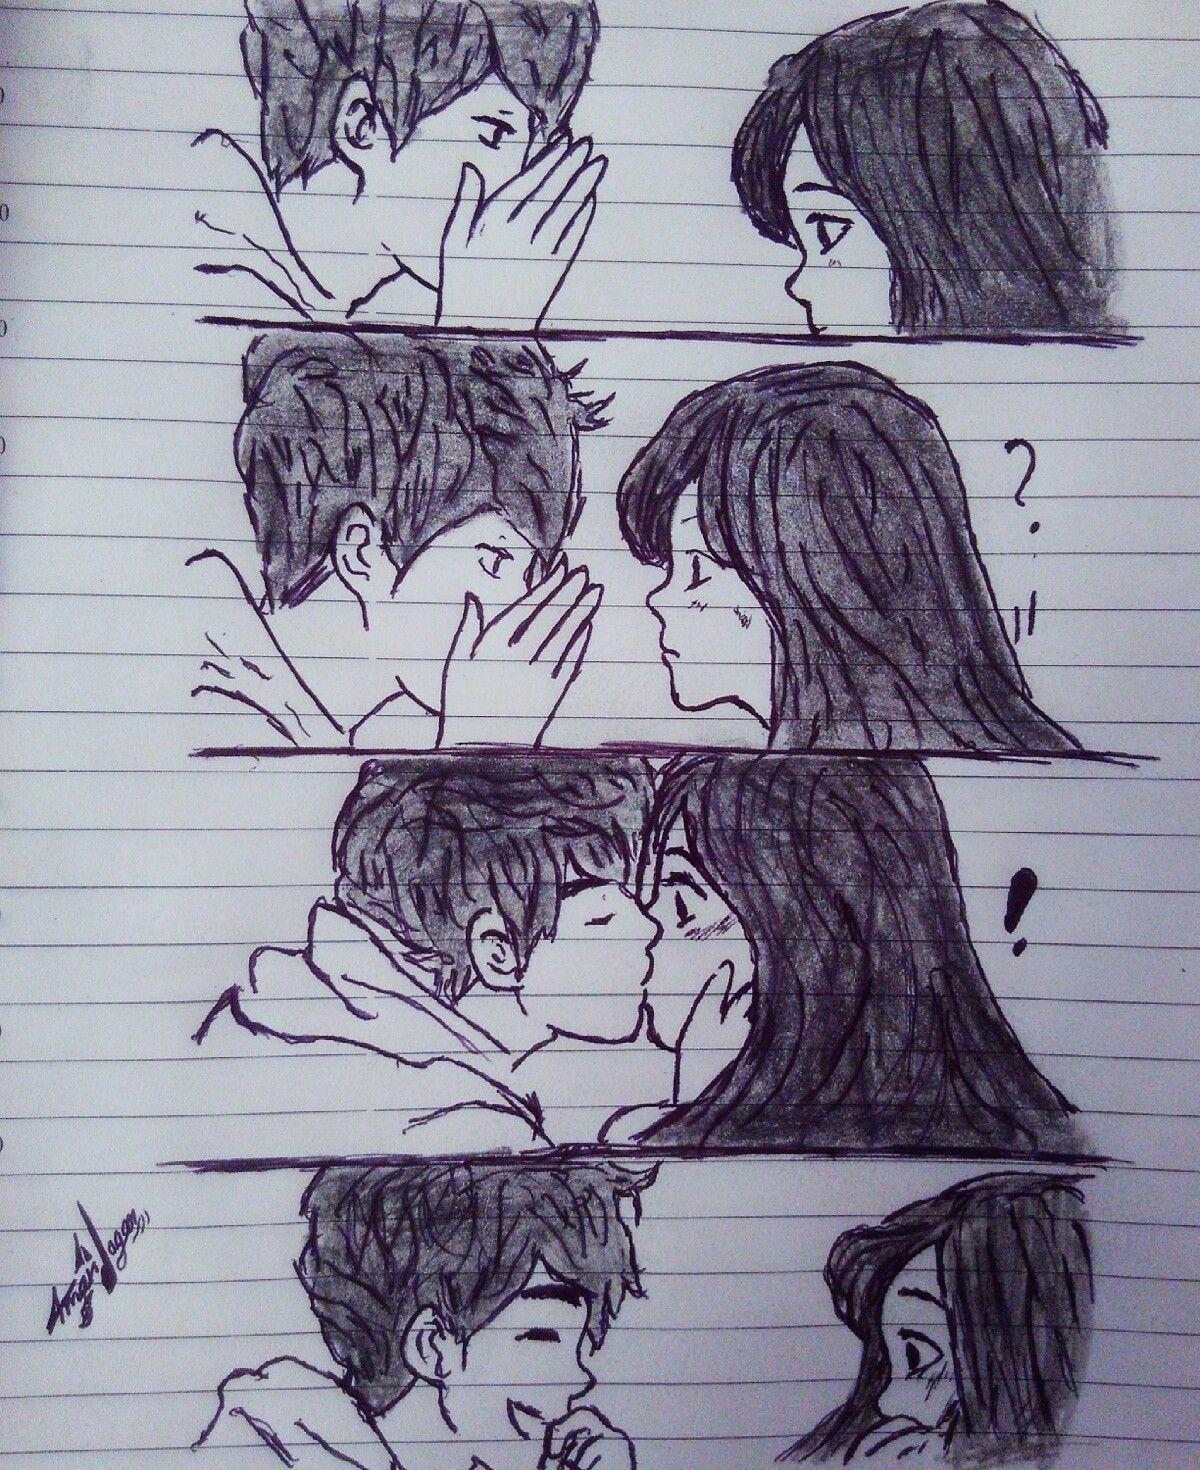 Kissing Sketch Step Kissing Sketch Romantic Couple Sketch Romantic Kissing Sketch Aman Nagar Sketch Pencil Sketch Images Couple Sketch Matisse Art